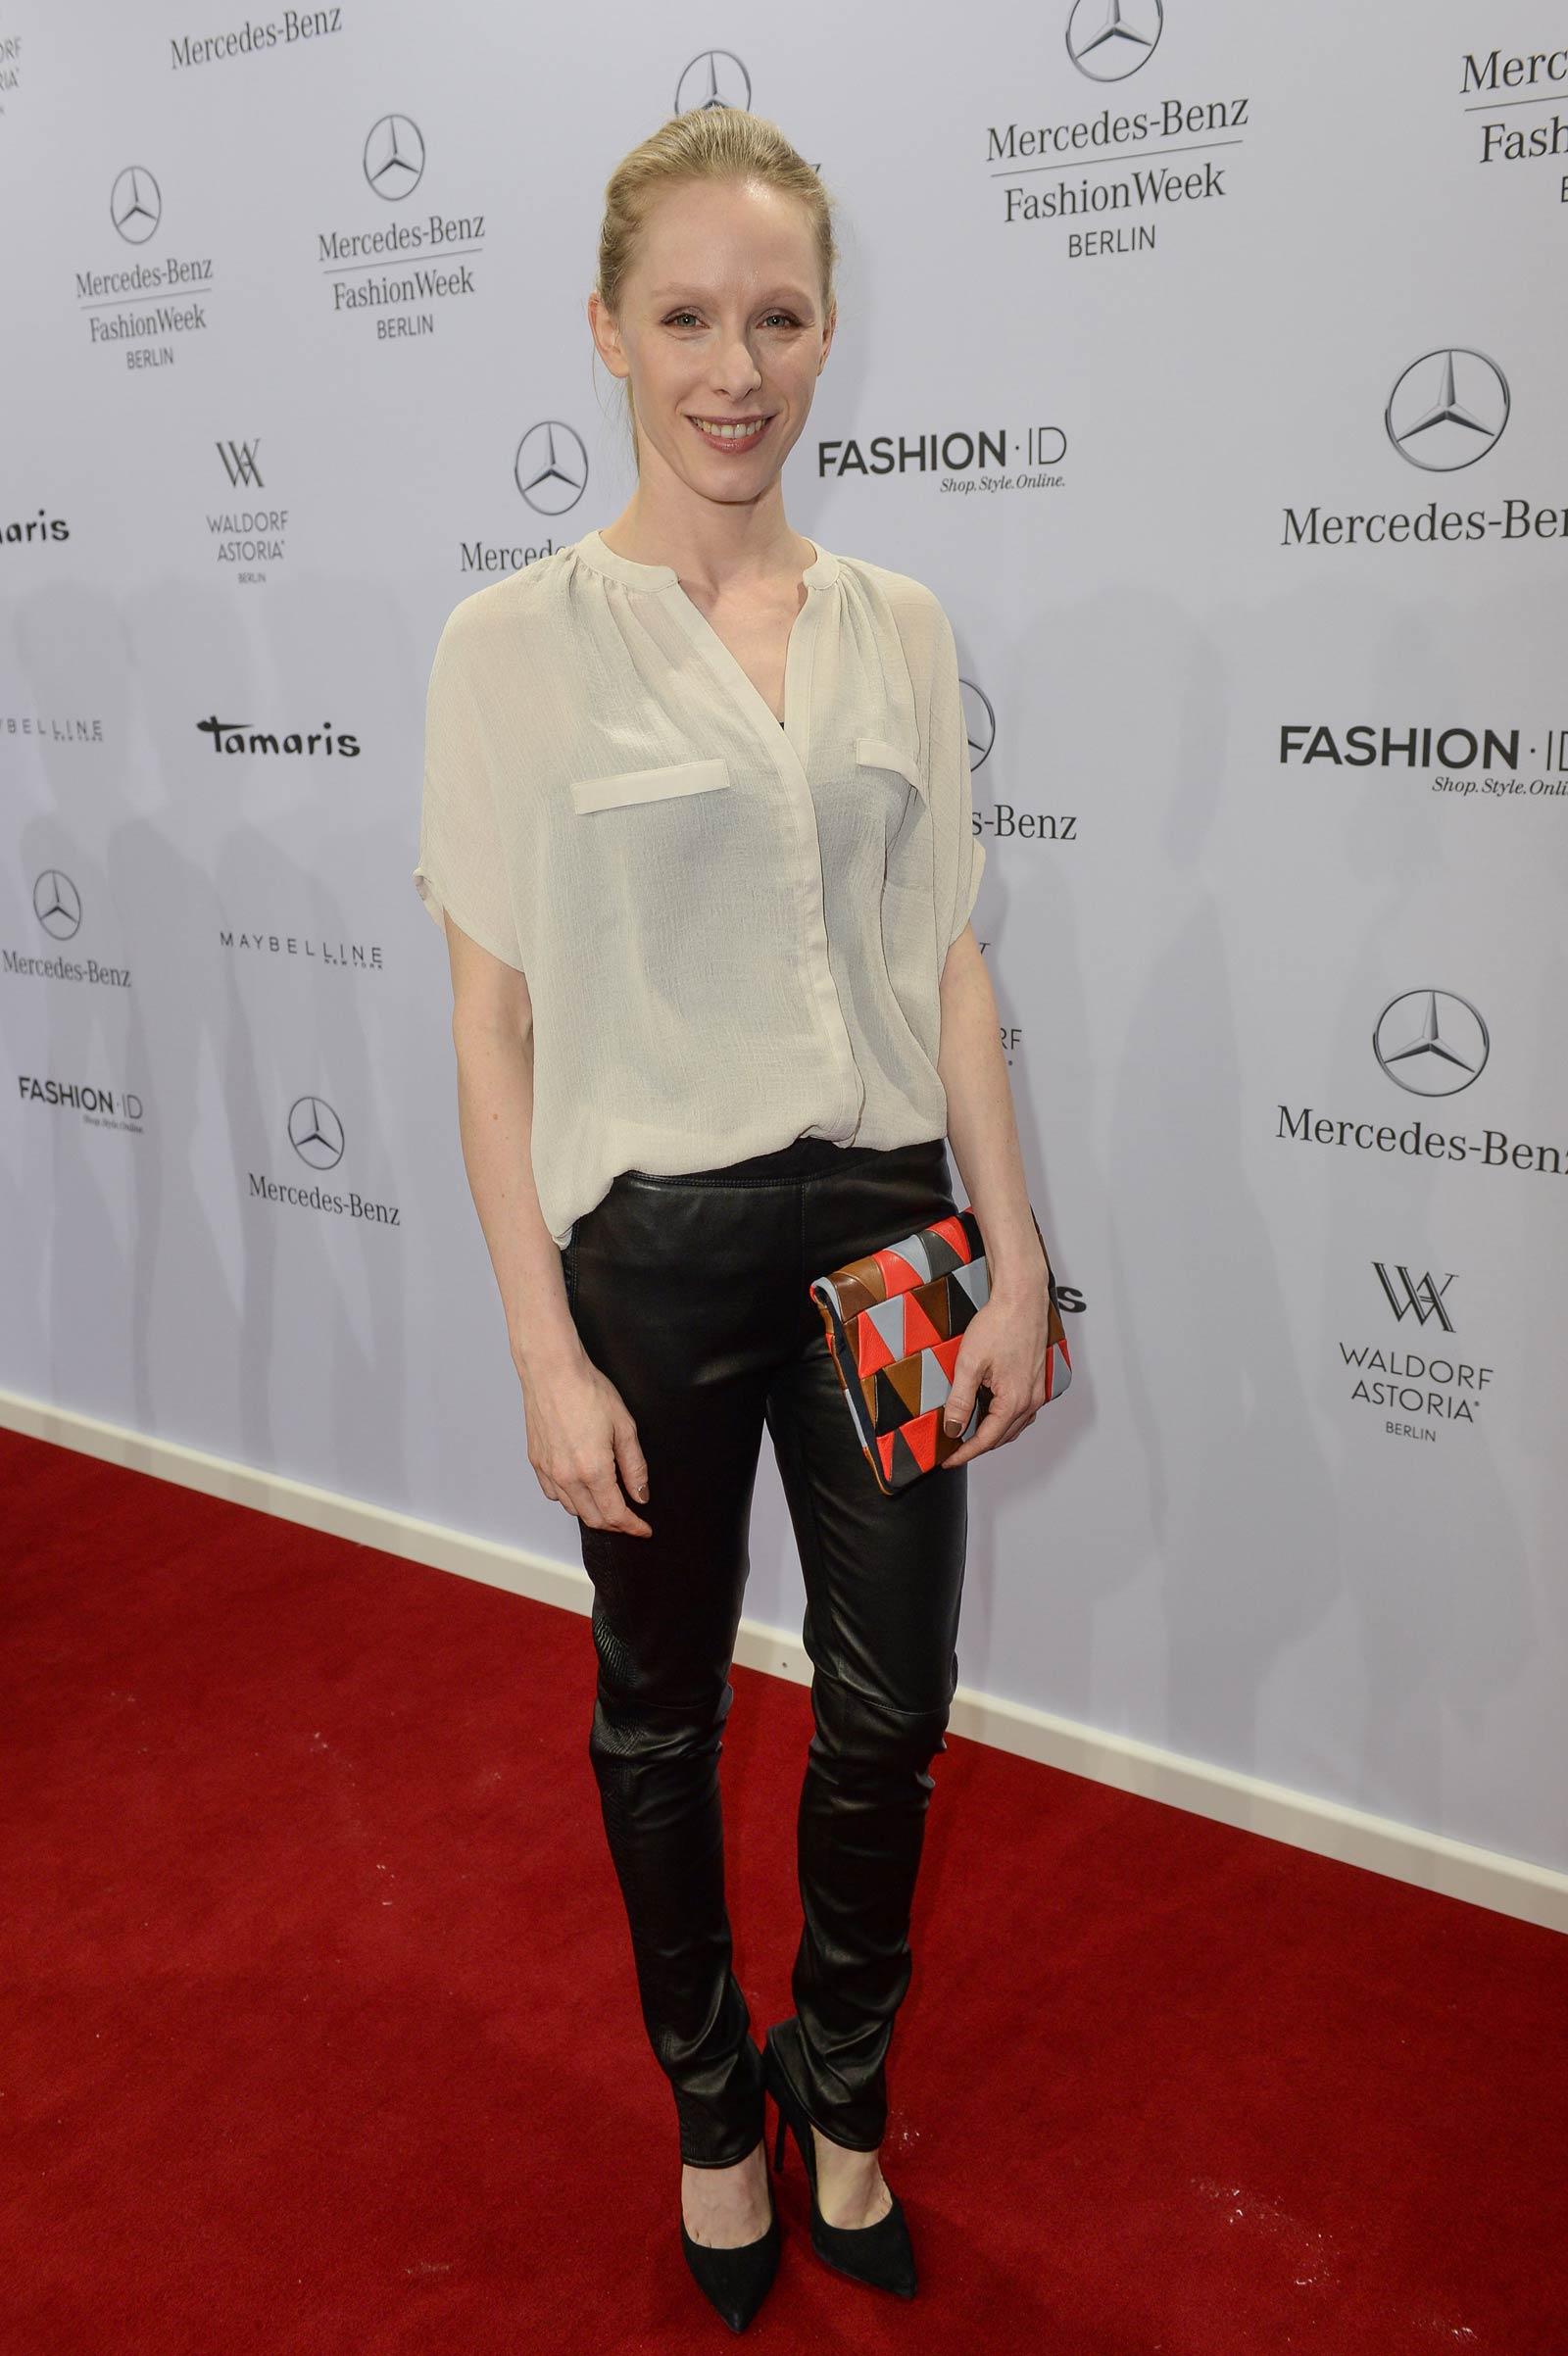 Susanne Wuest attends Merceses Benz Fashion Week